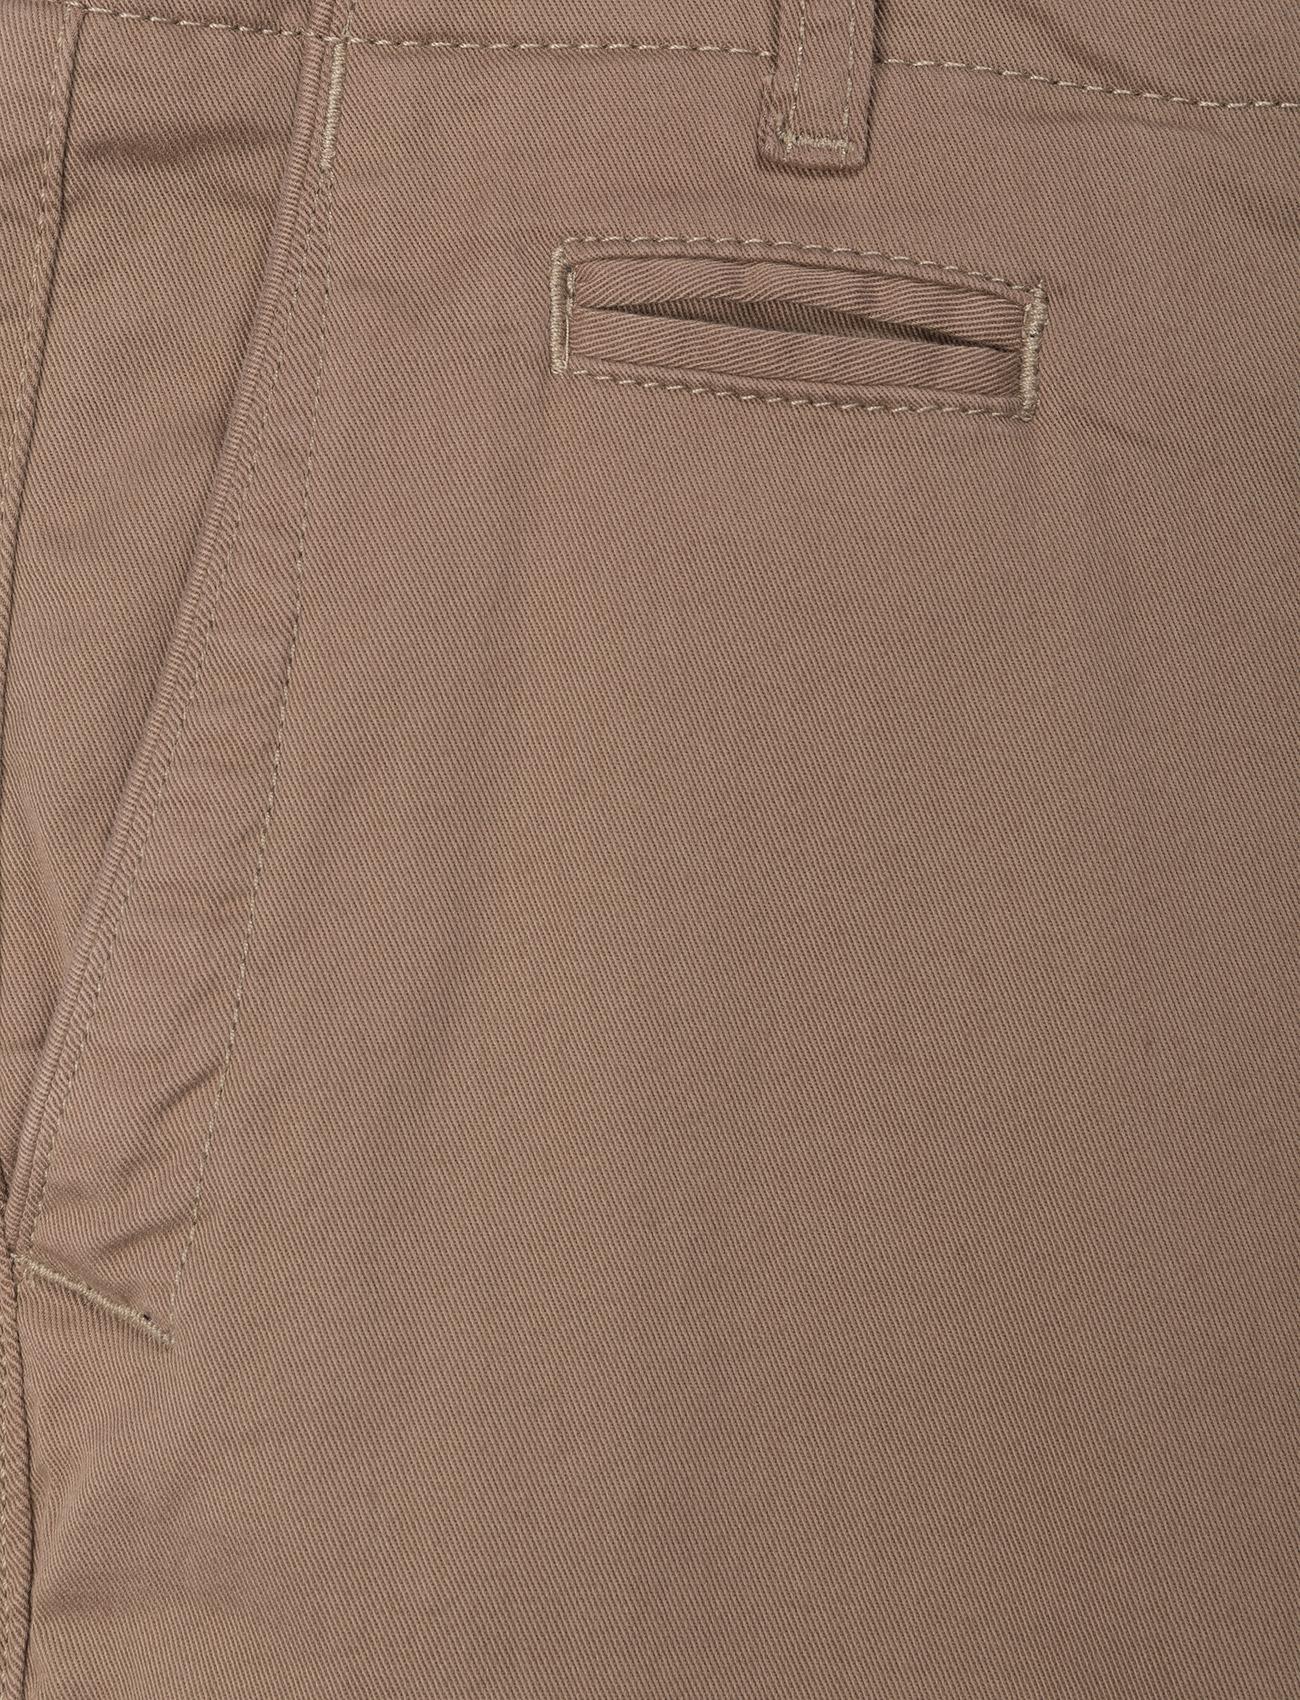 Knowledge Cotton Apparel - JOE chino pant - chino's - tuffet